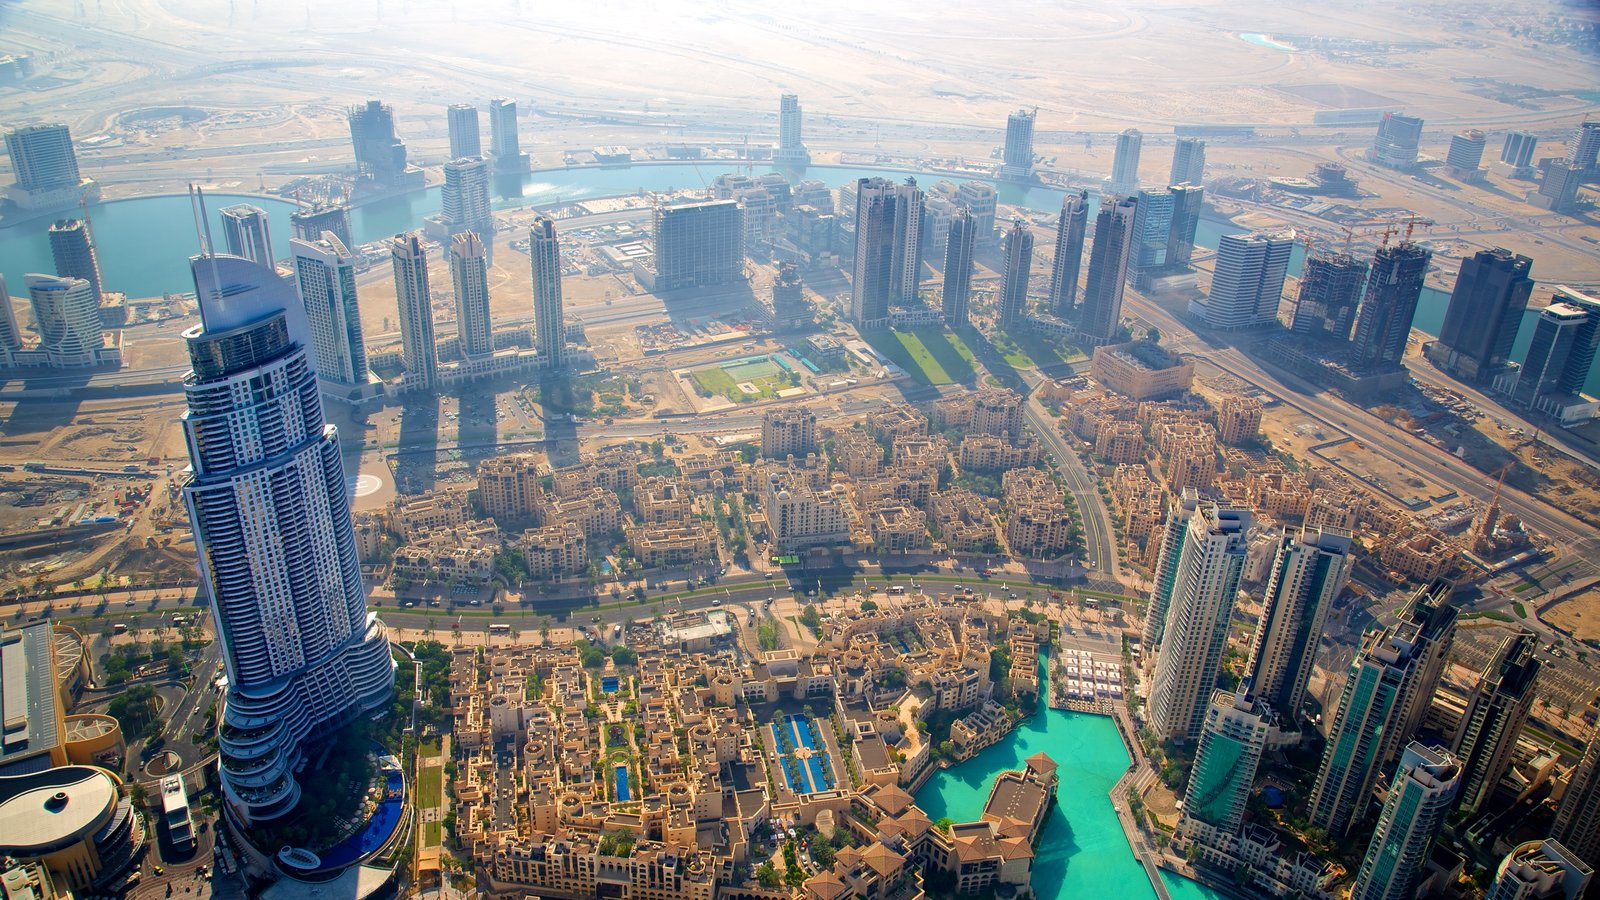 Burj Khalifa featuring a city, a skyscraper and cbd